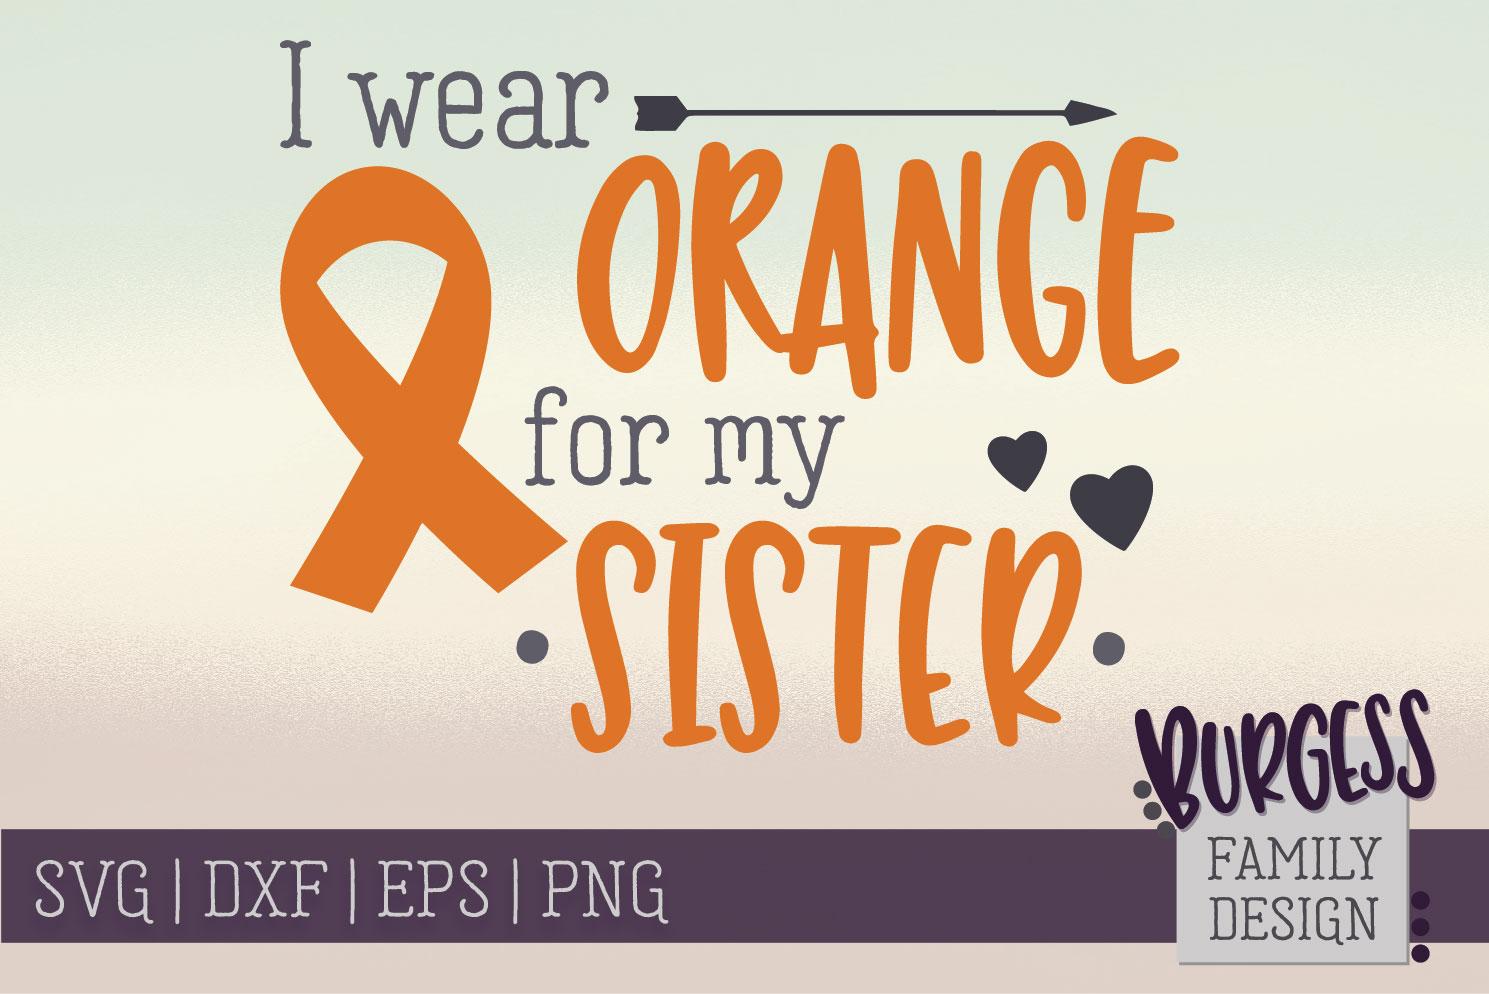 BUNDLE | I wear orange for my family | SVG DXF EPS PN example image 9